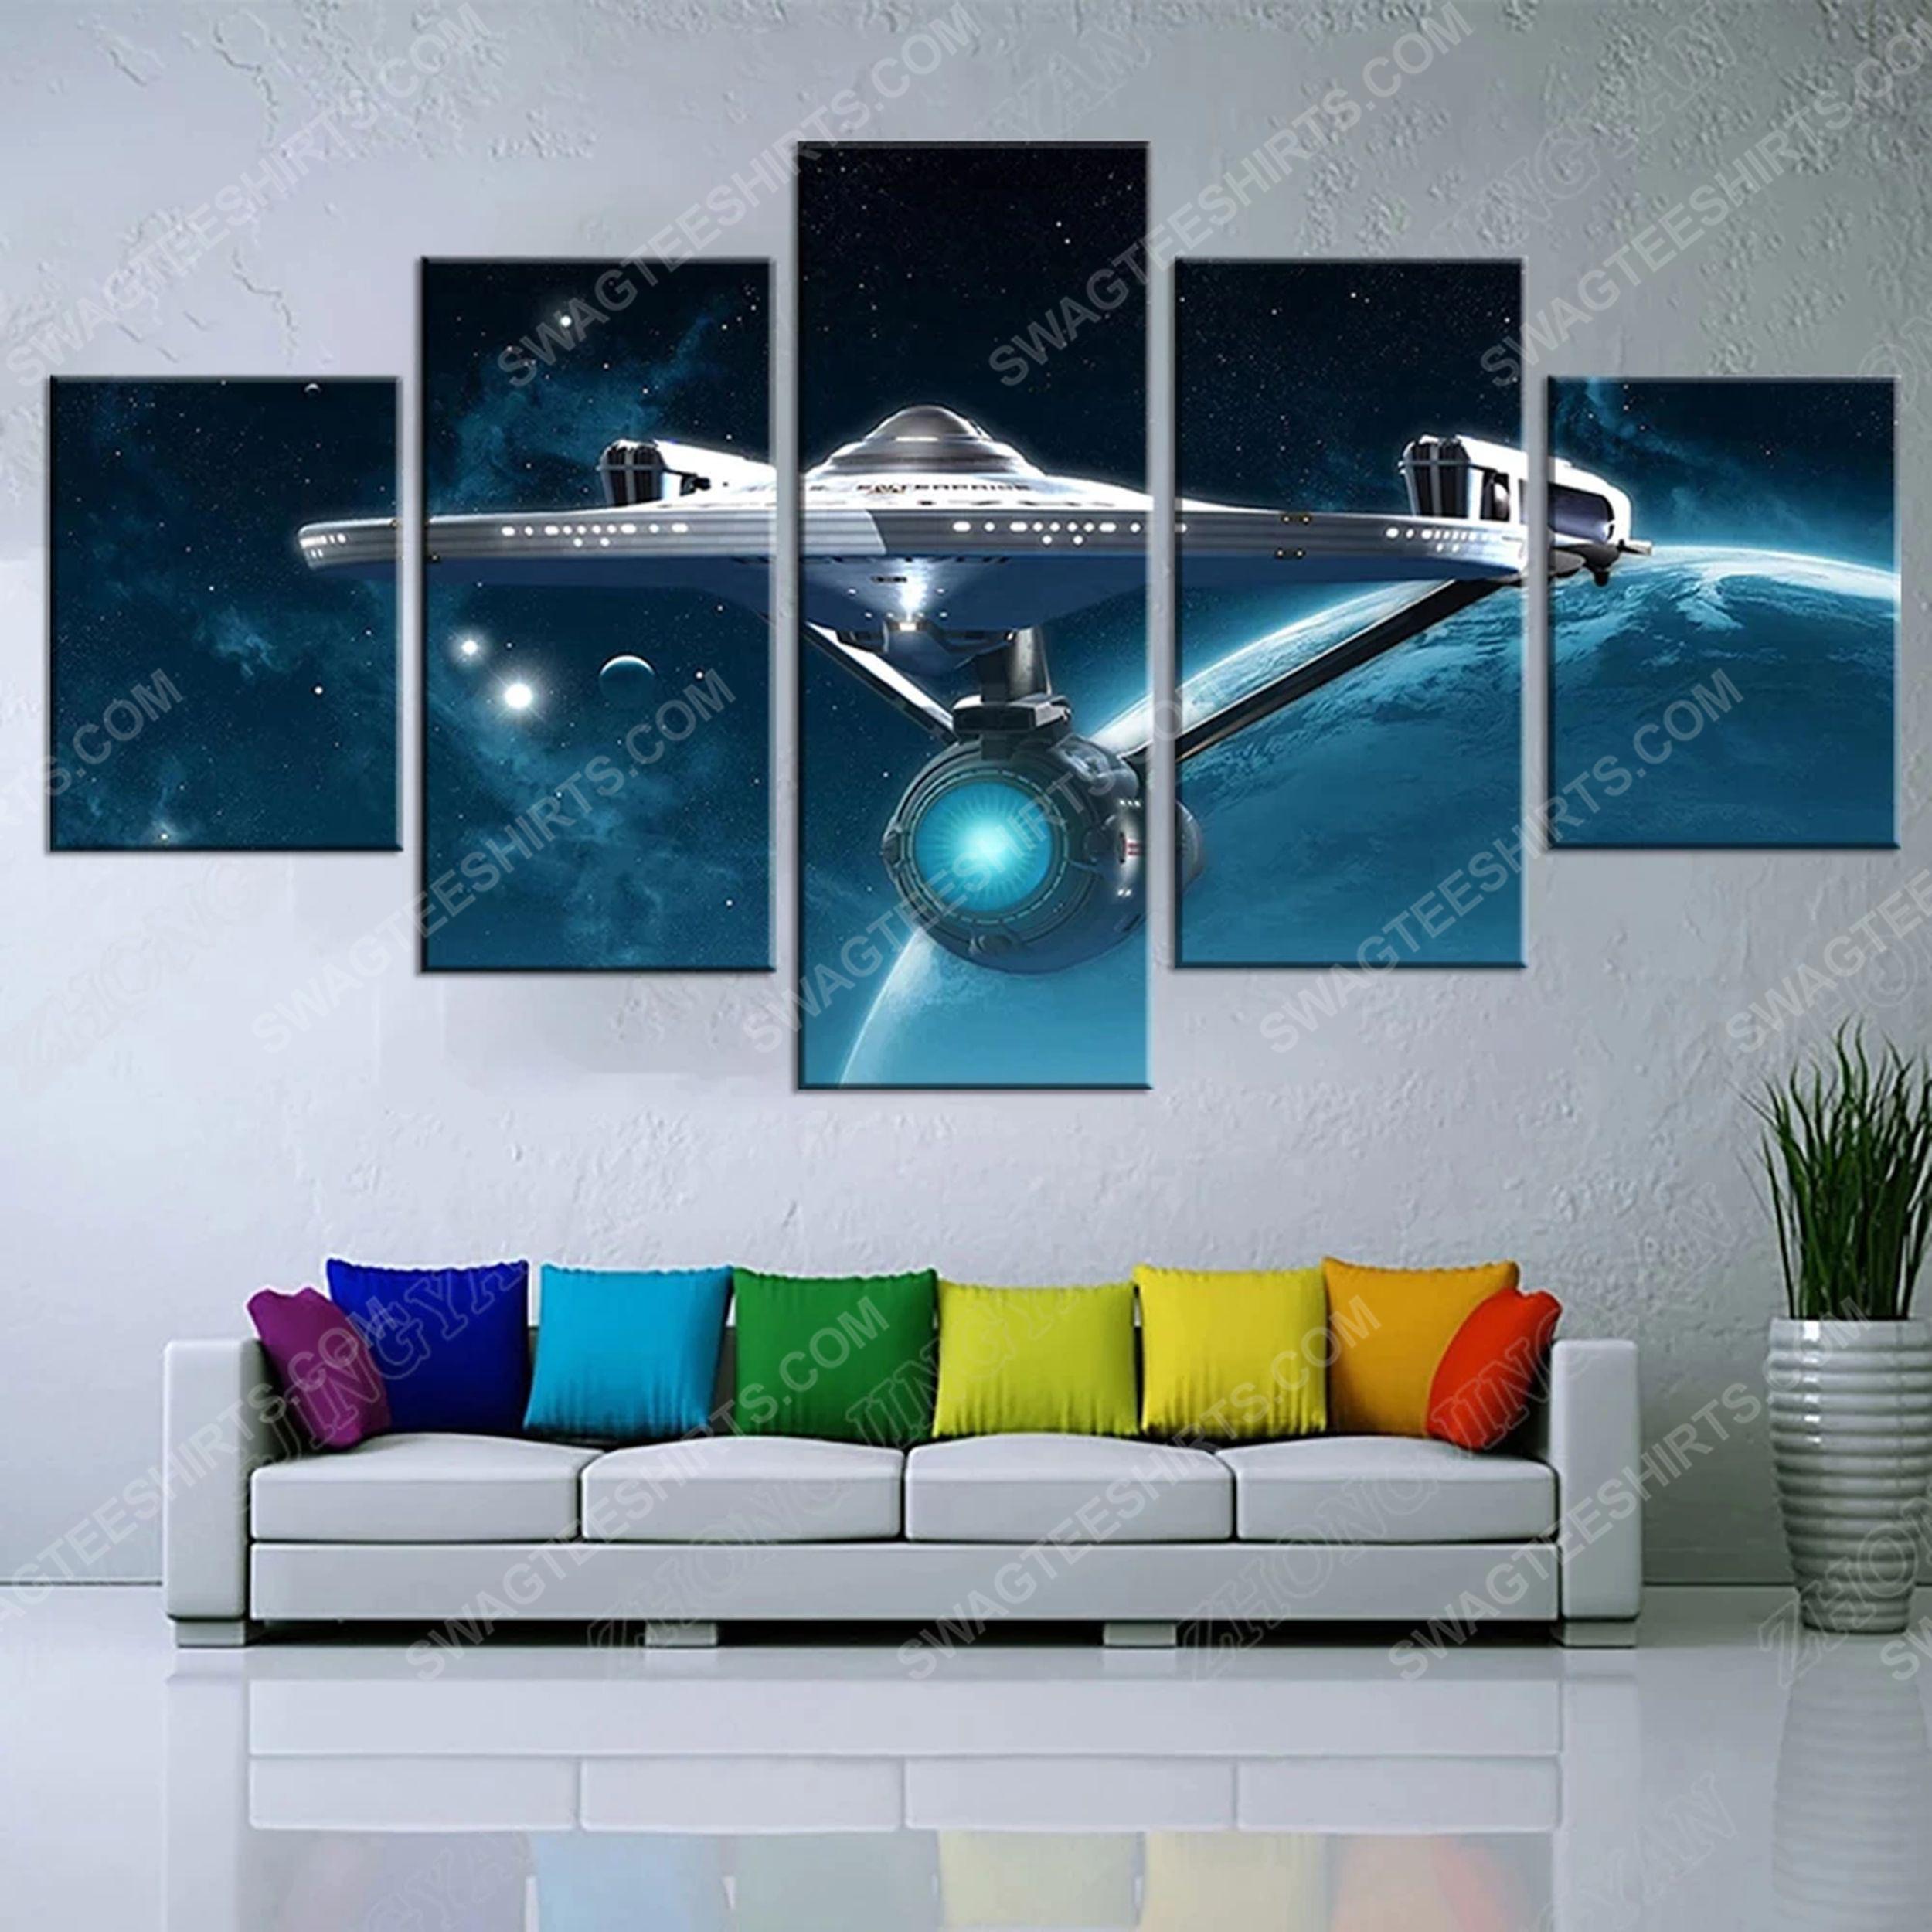 Star trek movie print painting canvas wall art home decor